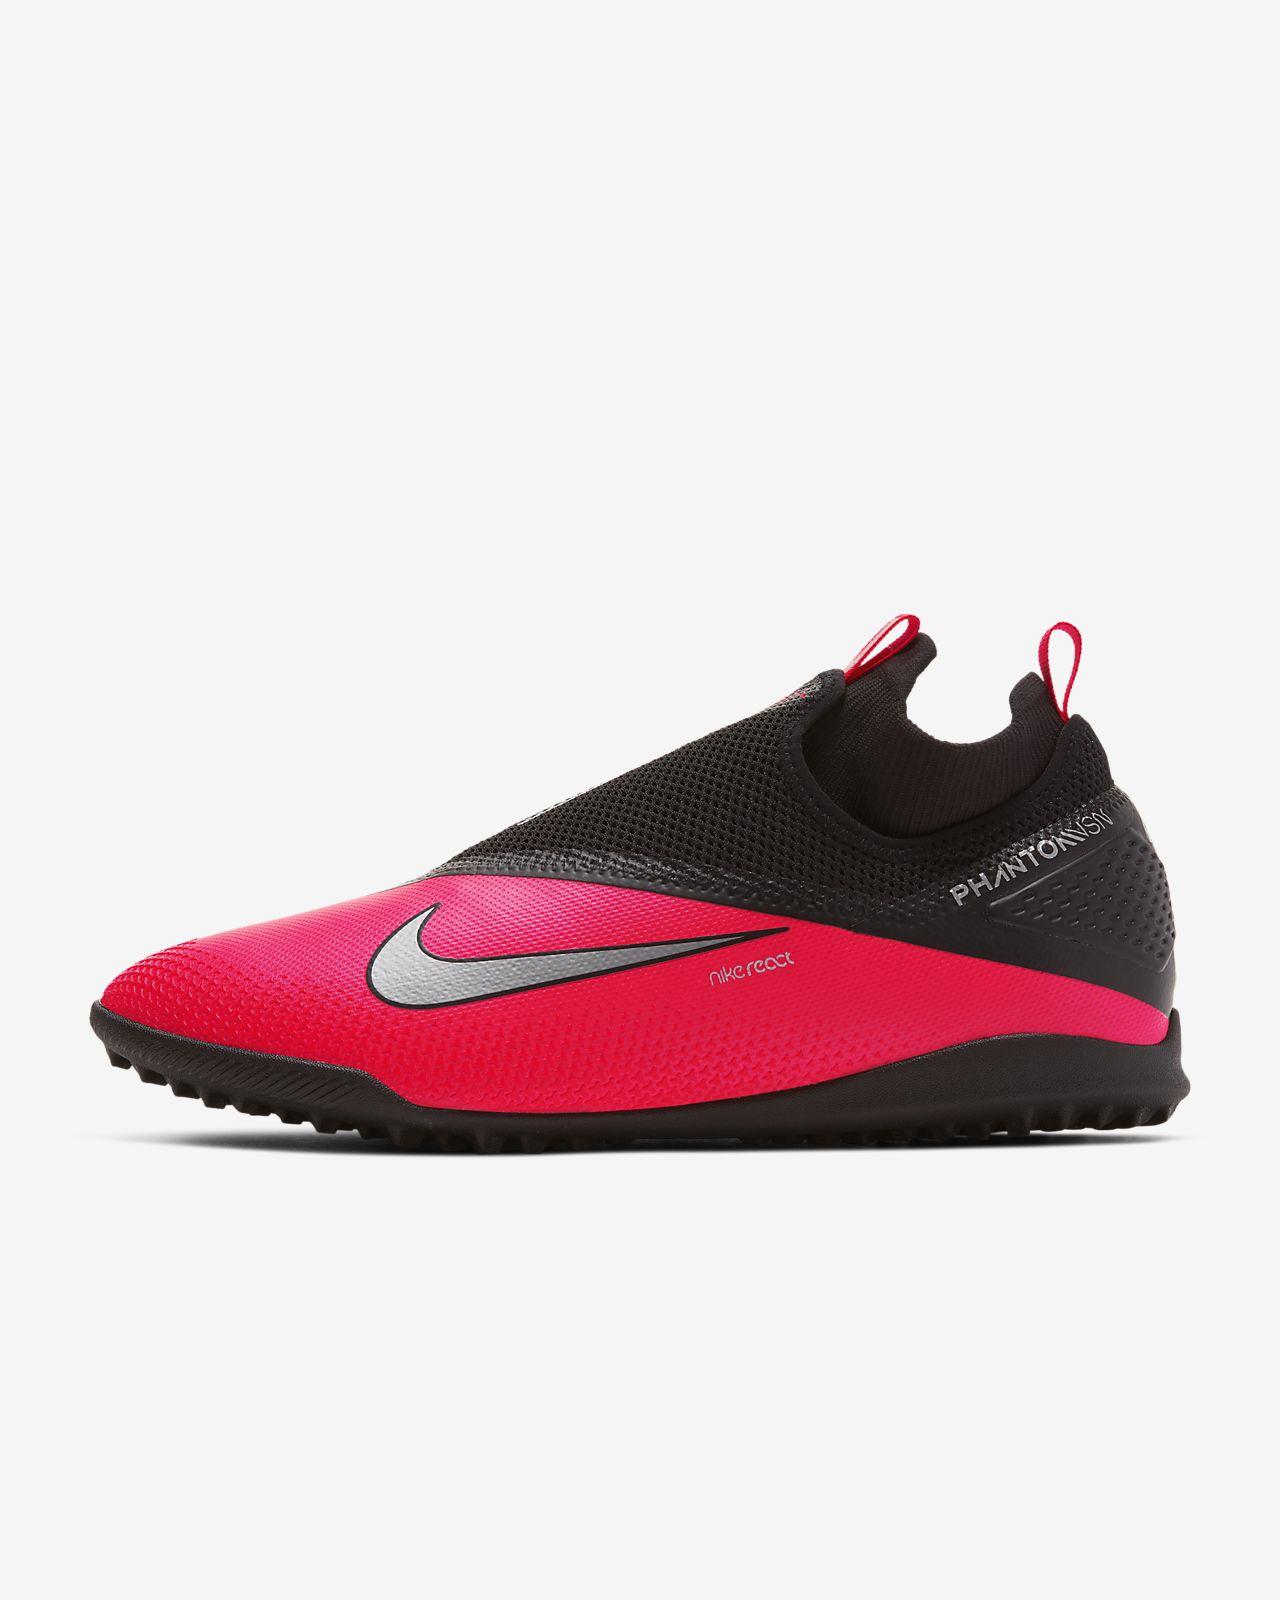 Kopačka na umělý povrch Nike React Phantom Vision 2 Pro Dynamic Fit TF